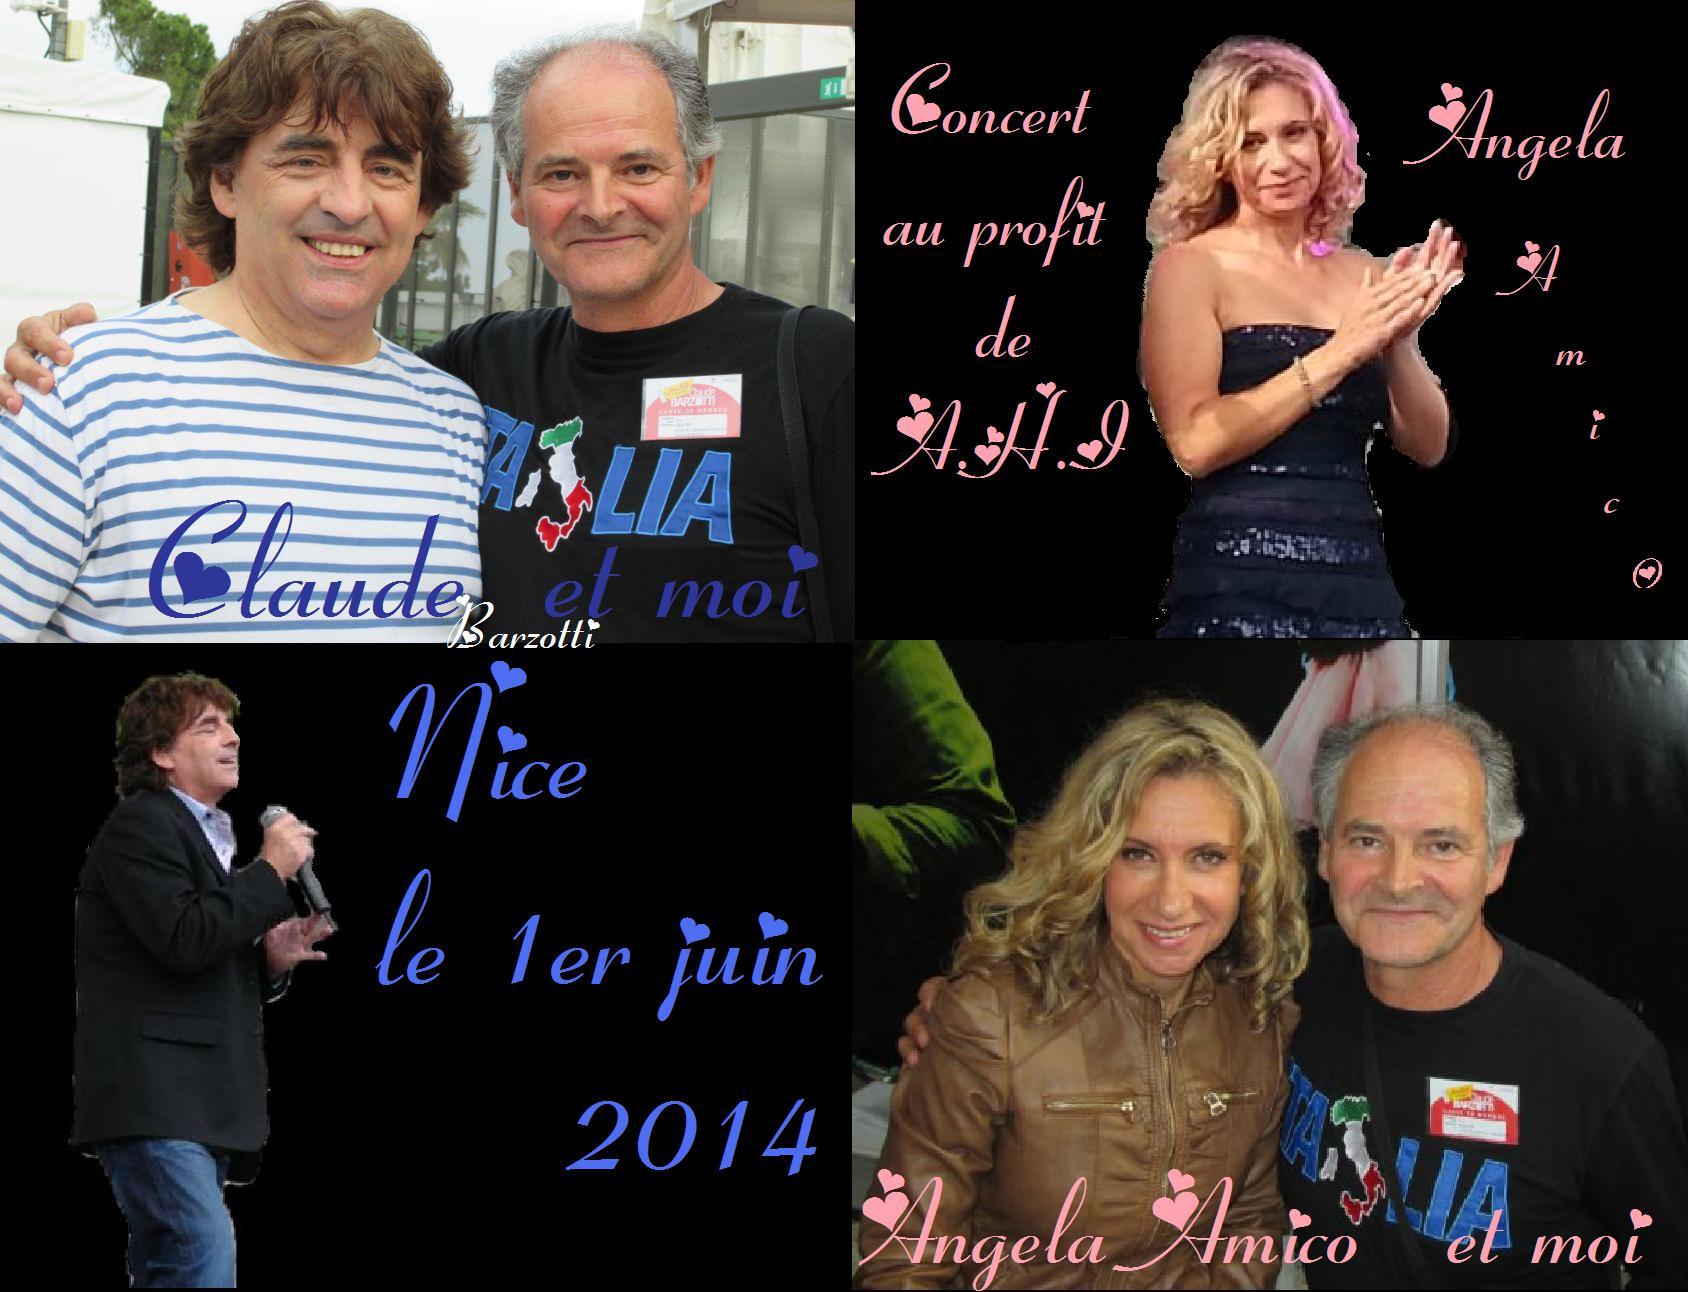 Blog de barzotti83 : Rikounet 83, Concert NICE au profit de AHI